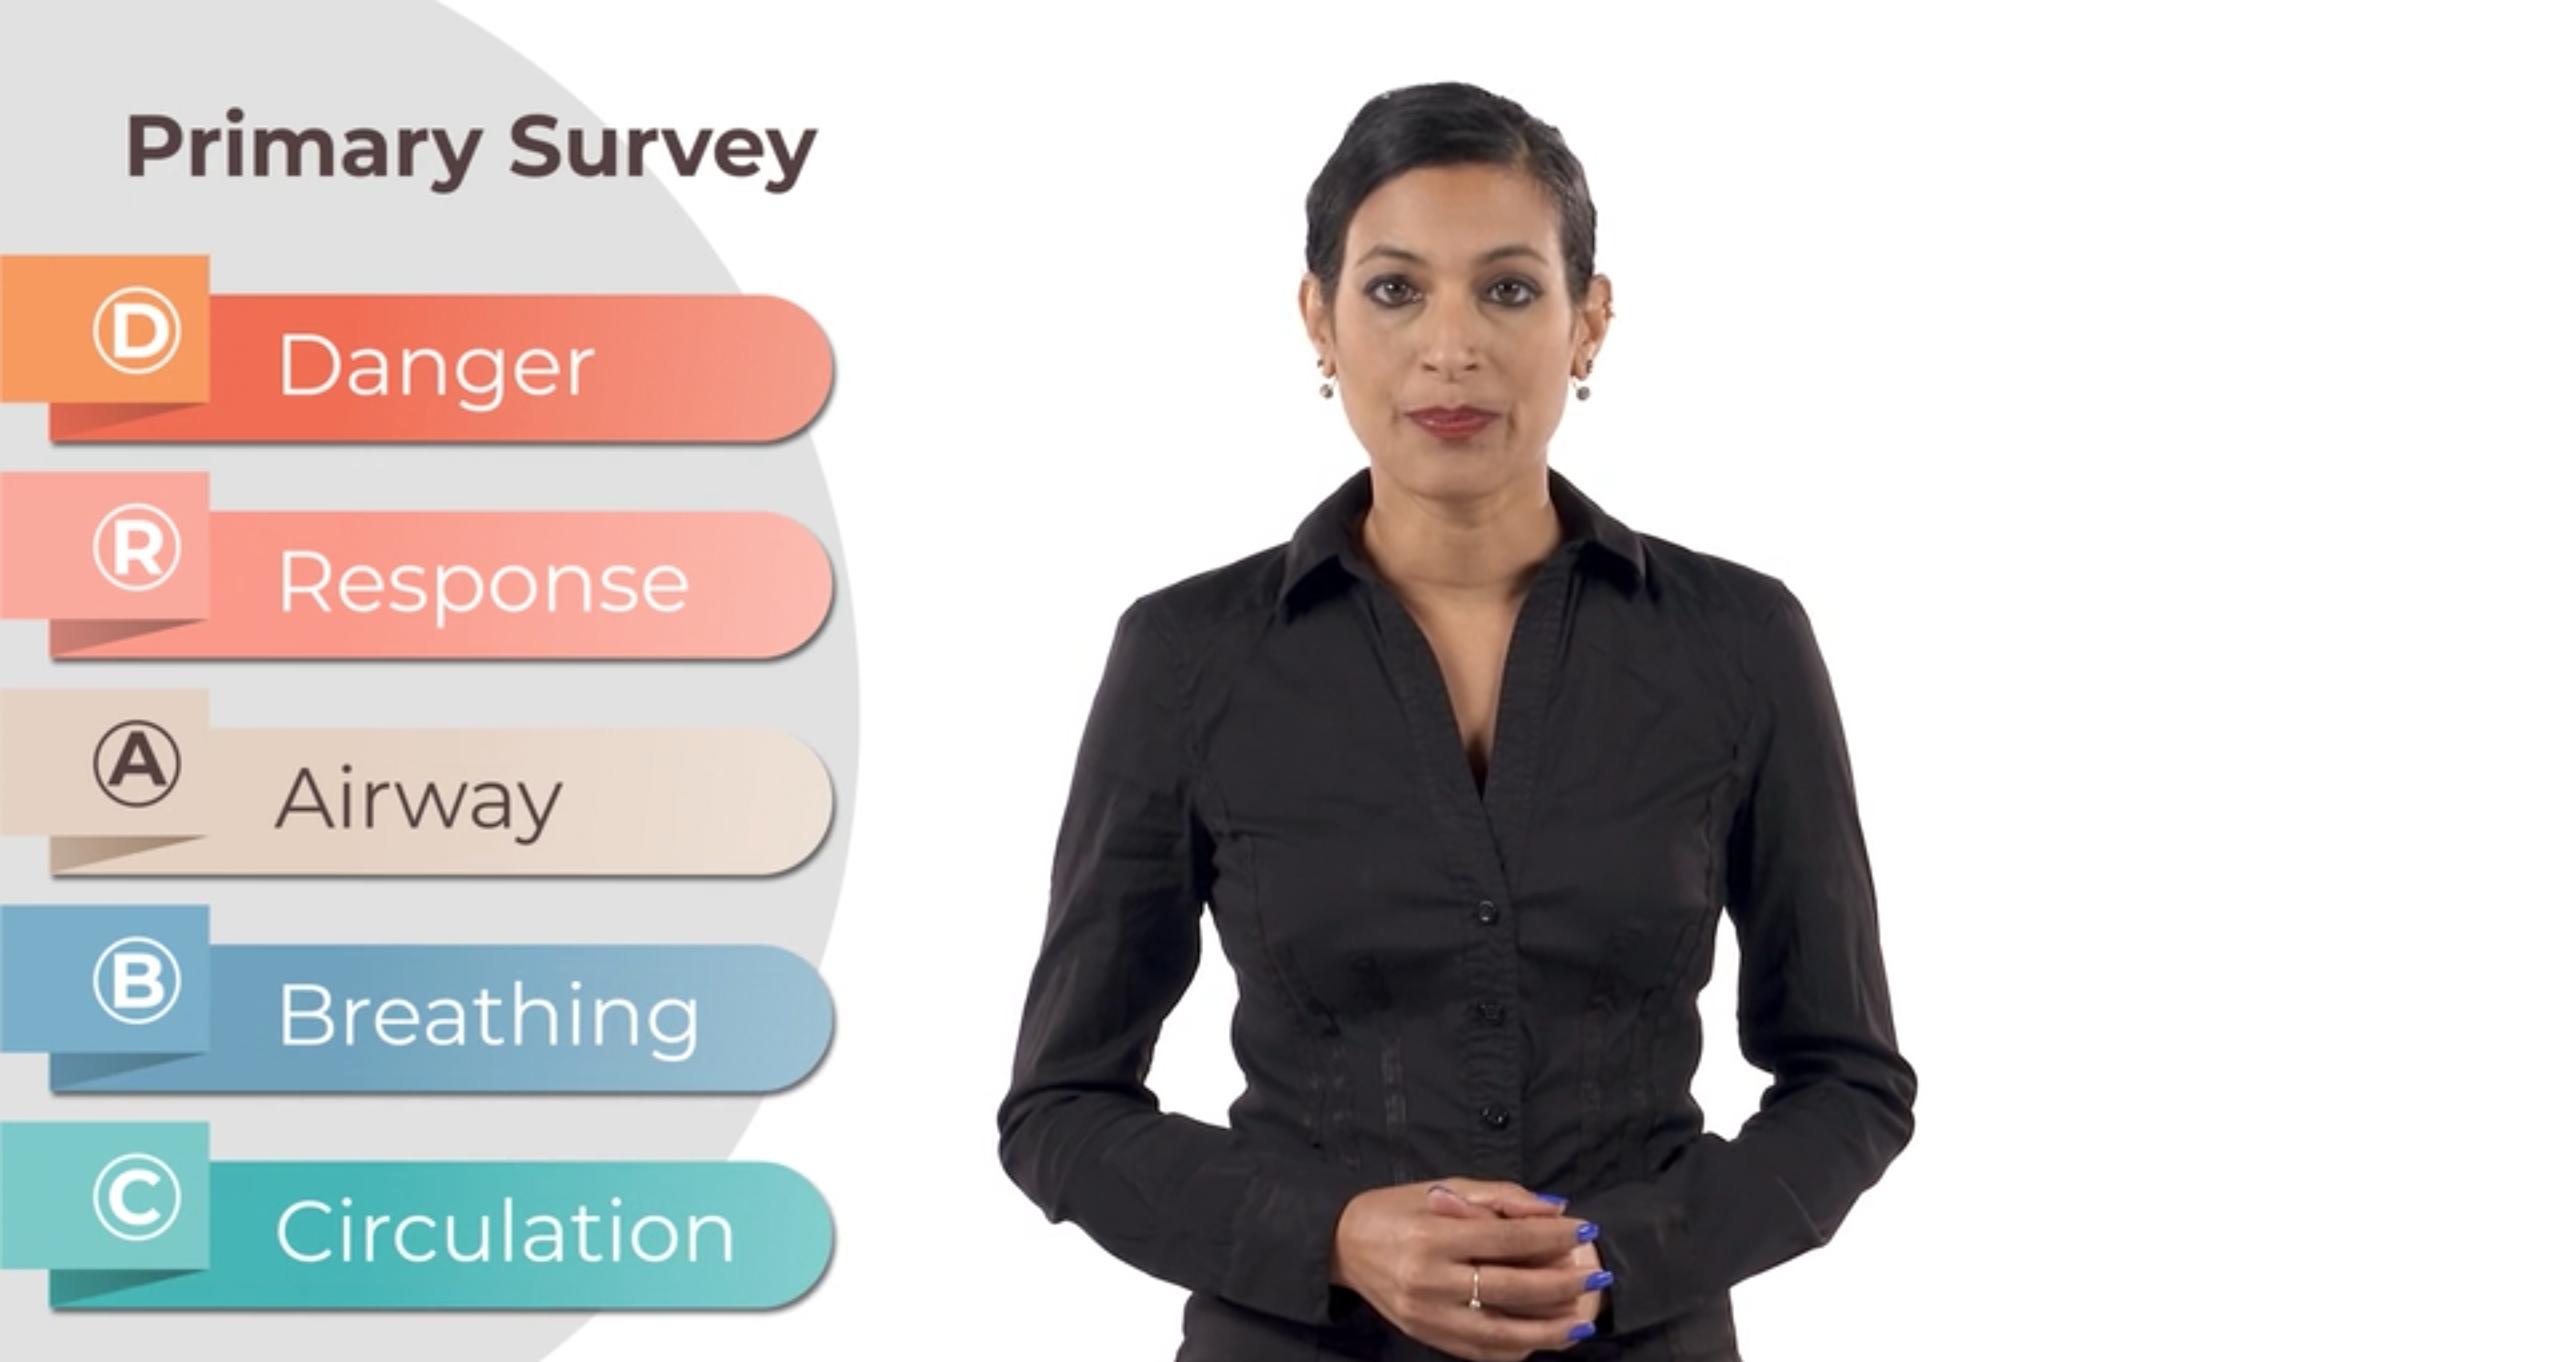 How to do the primary survey youtube thumbnail